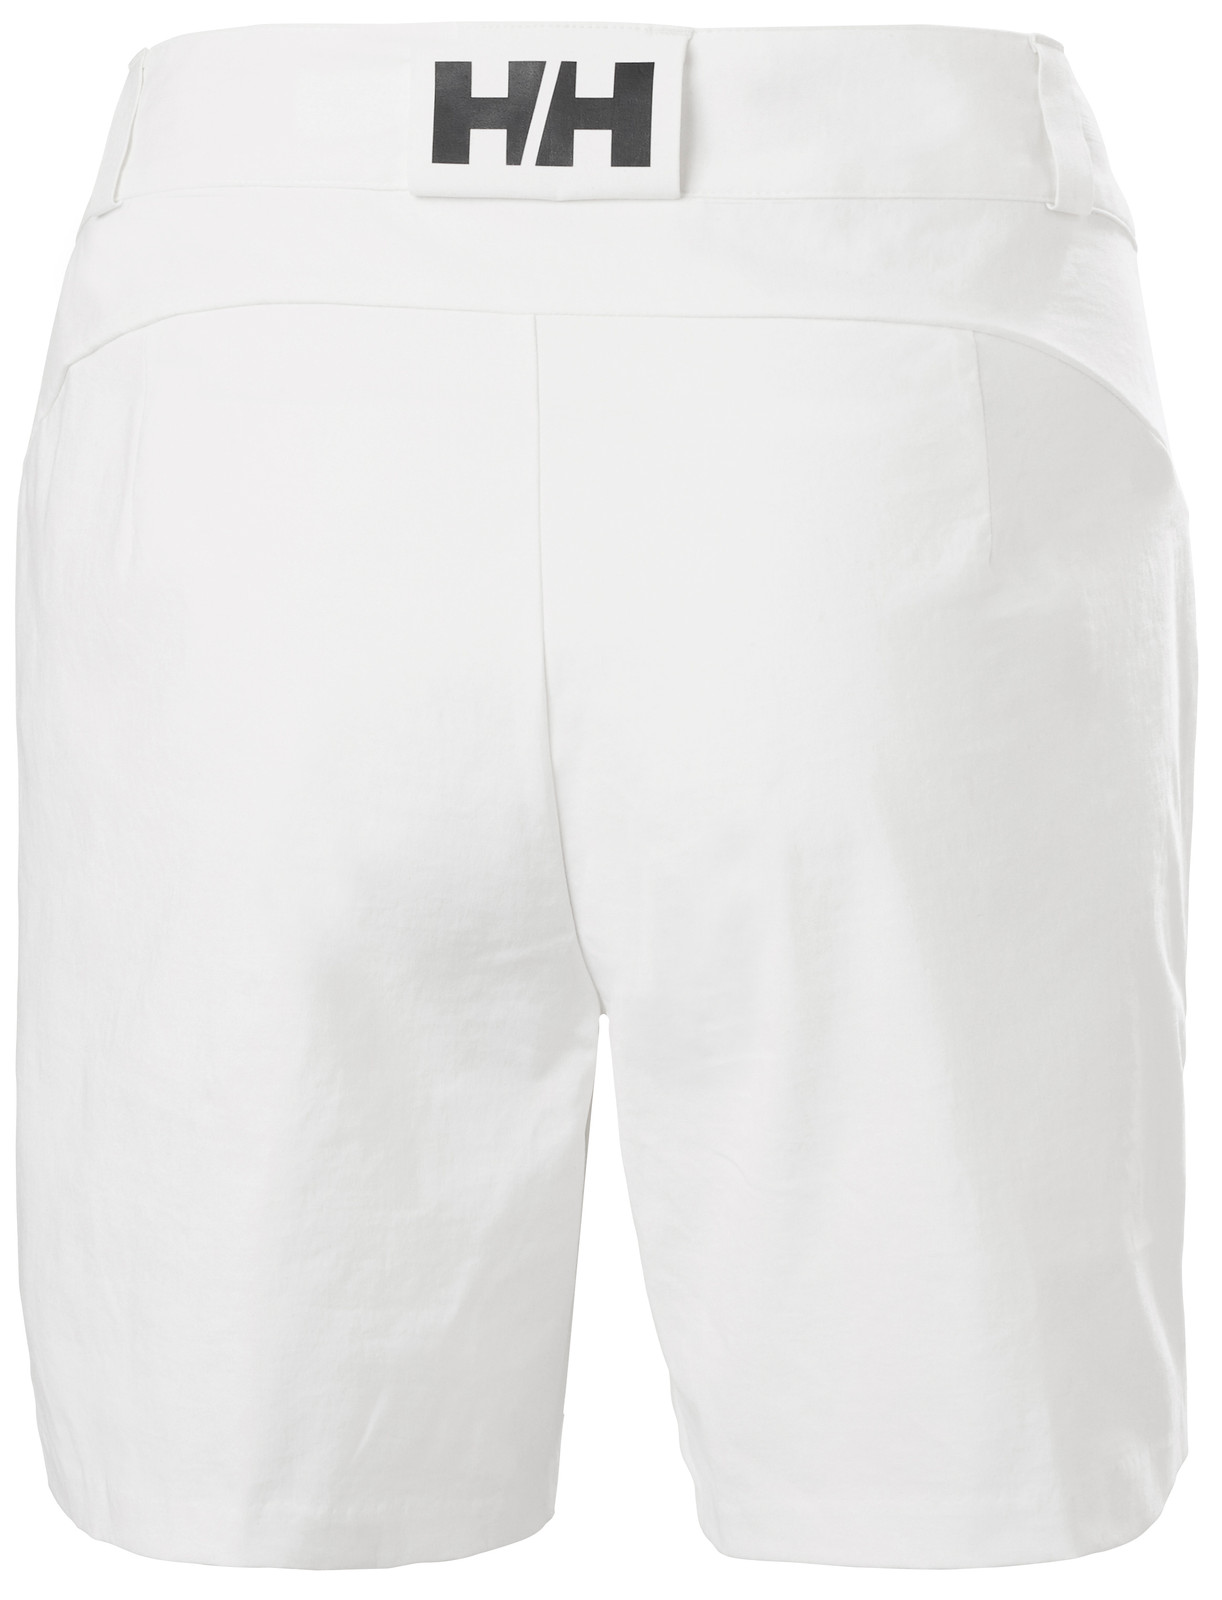 Helly Hansen HP Racing Short, Women's - White, 34028-001 back